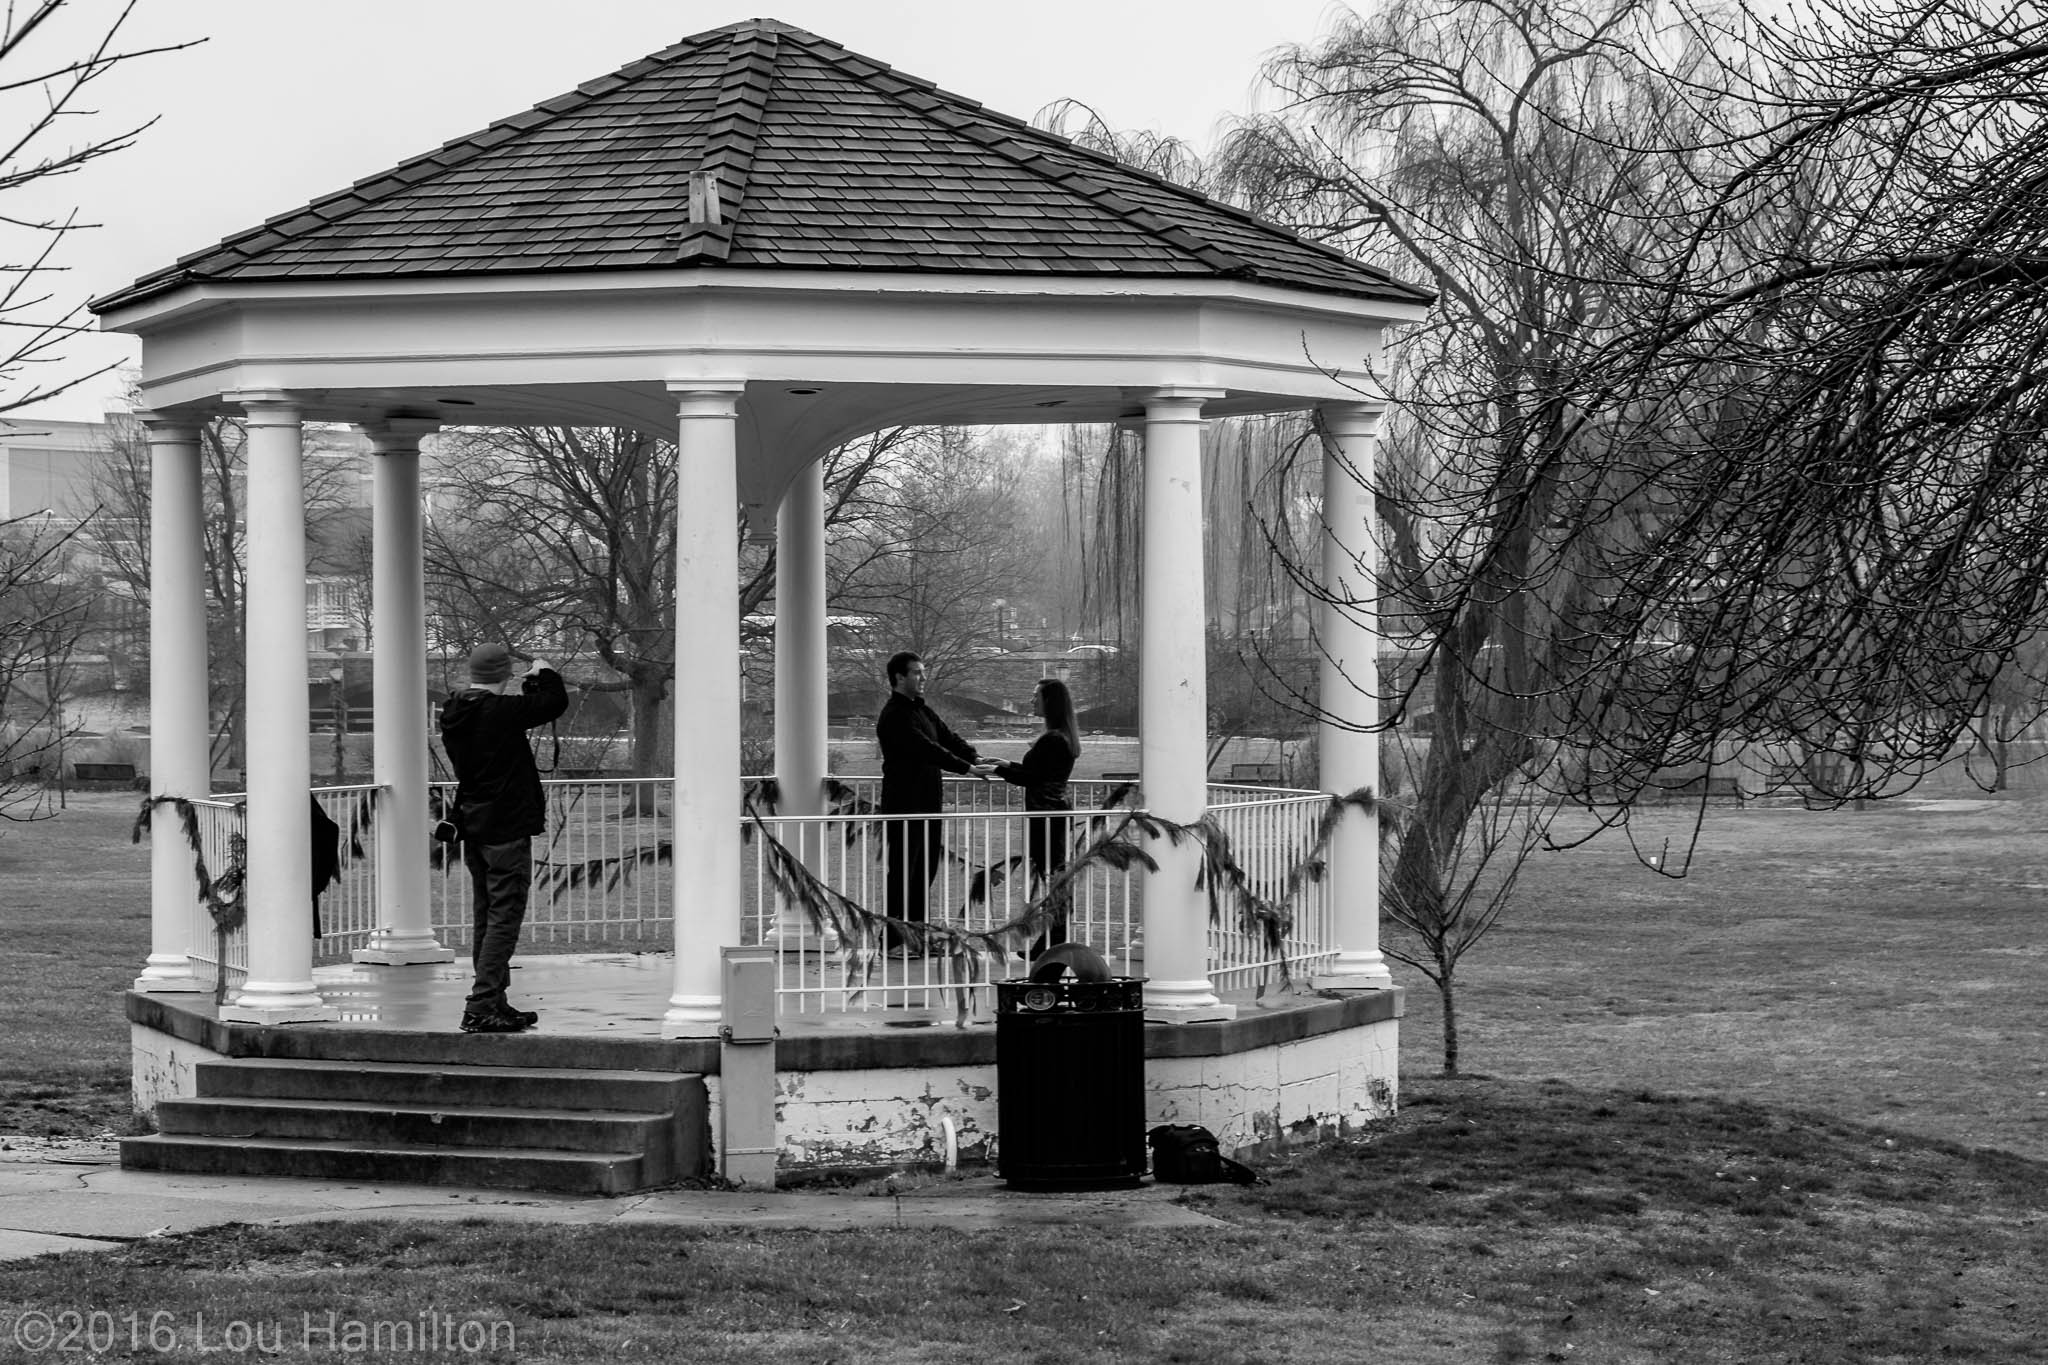 9 January 2016 -- Frederick, MD (Baker Park)